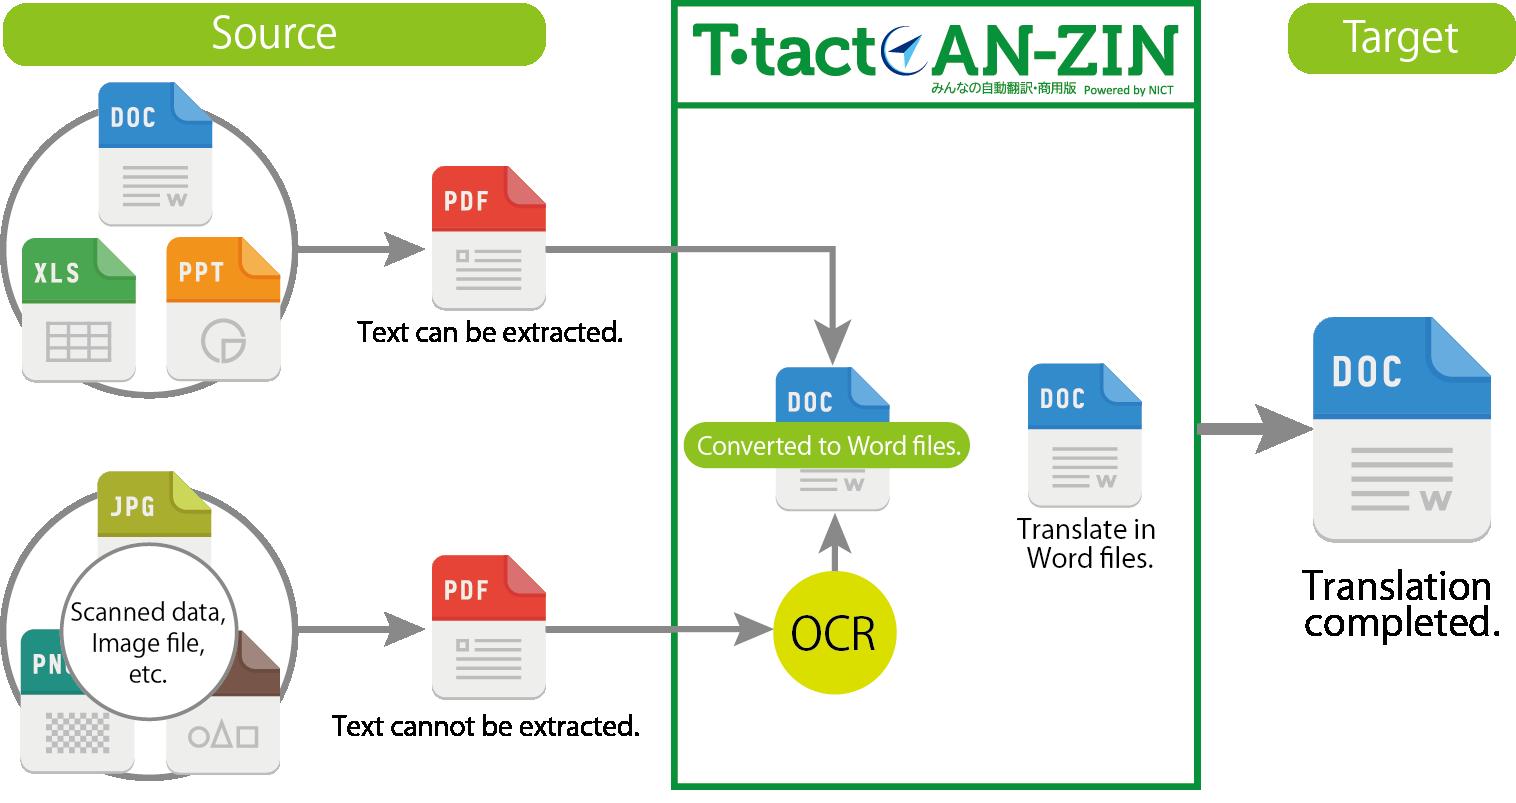 File translation image